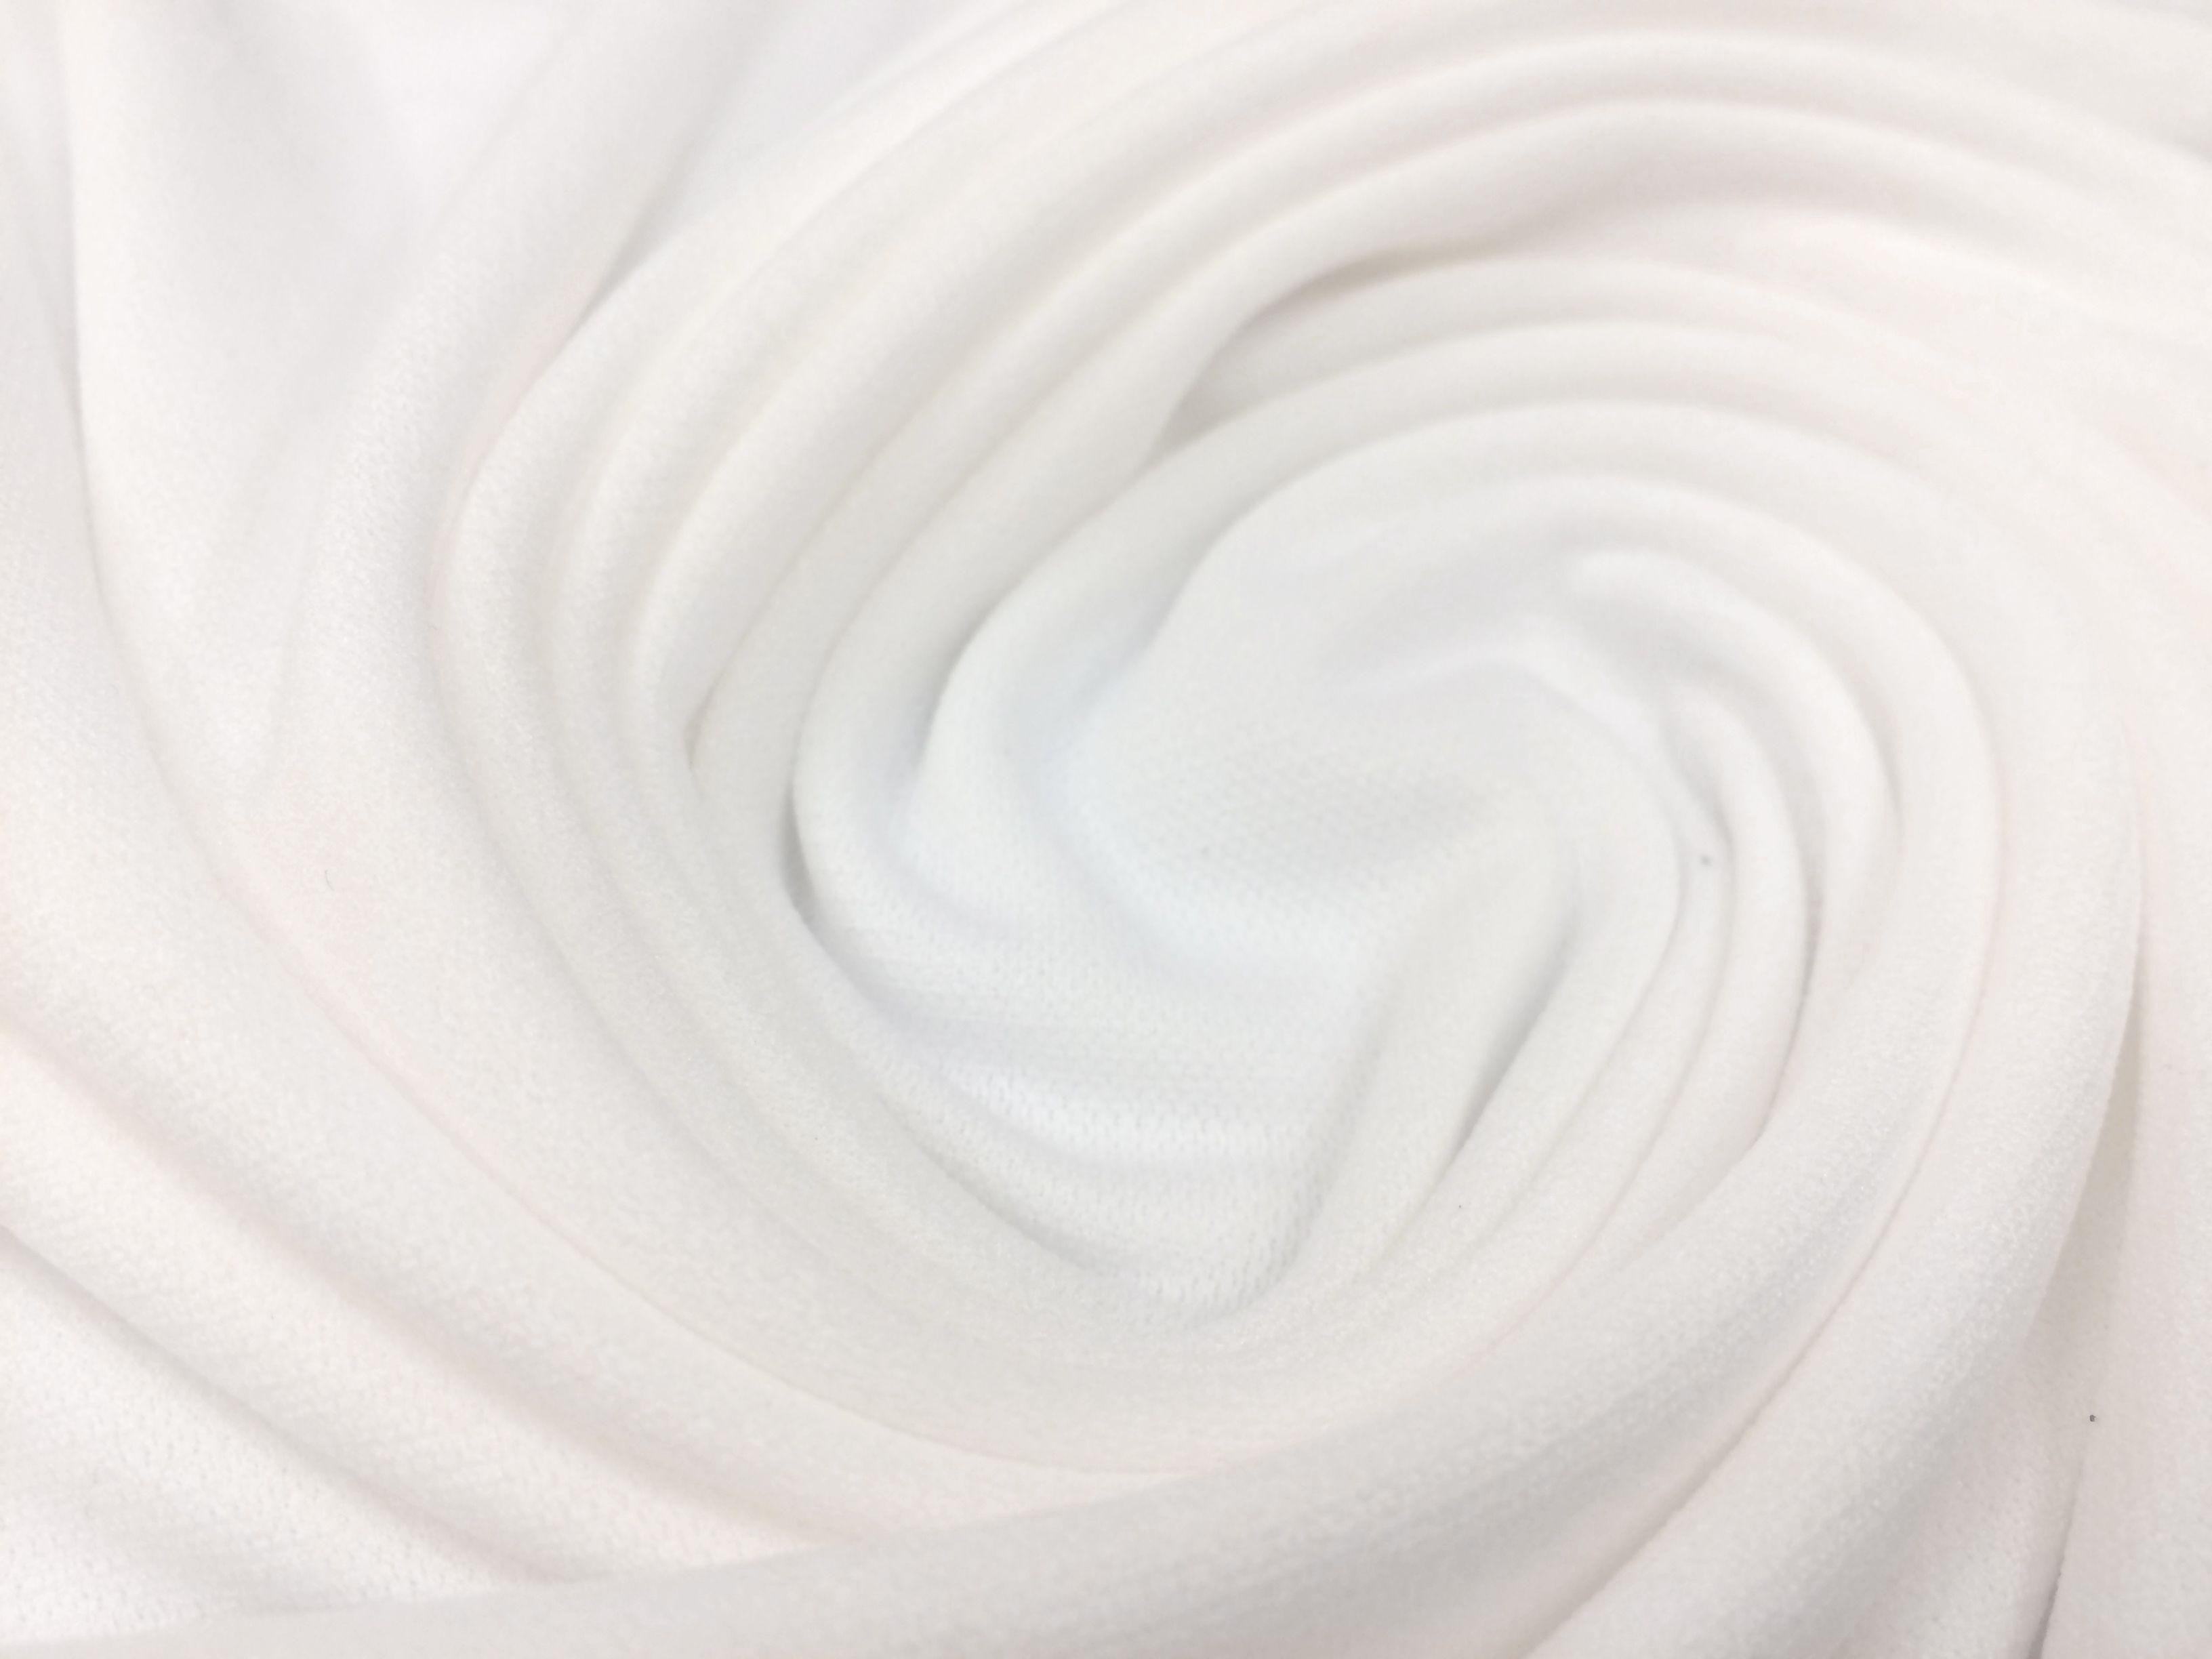 Forro Unicolor Blanco Helenca Linning 4 Way Stretch Por Metro